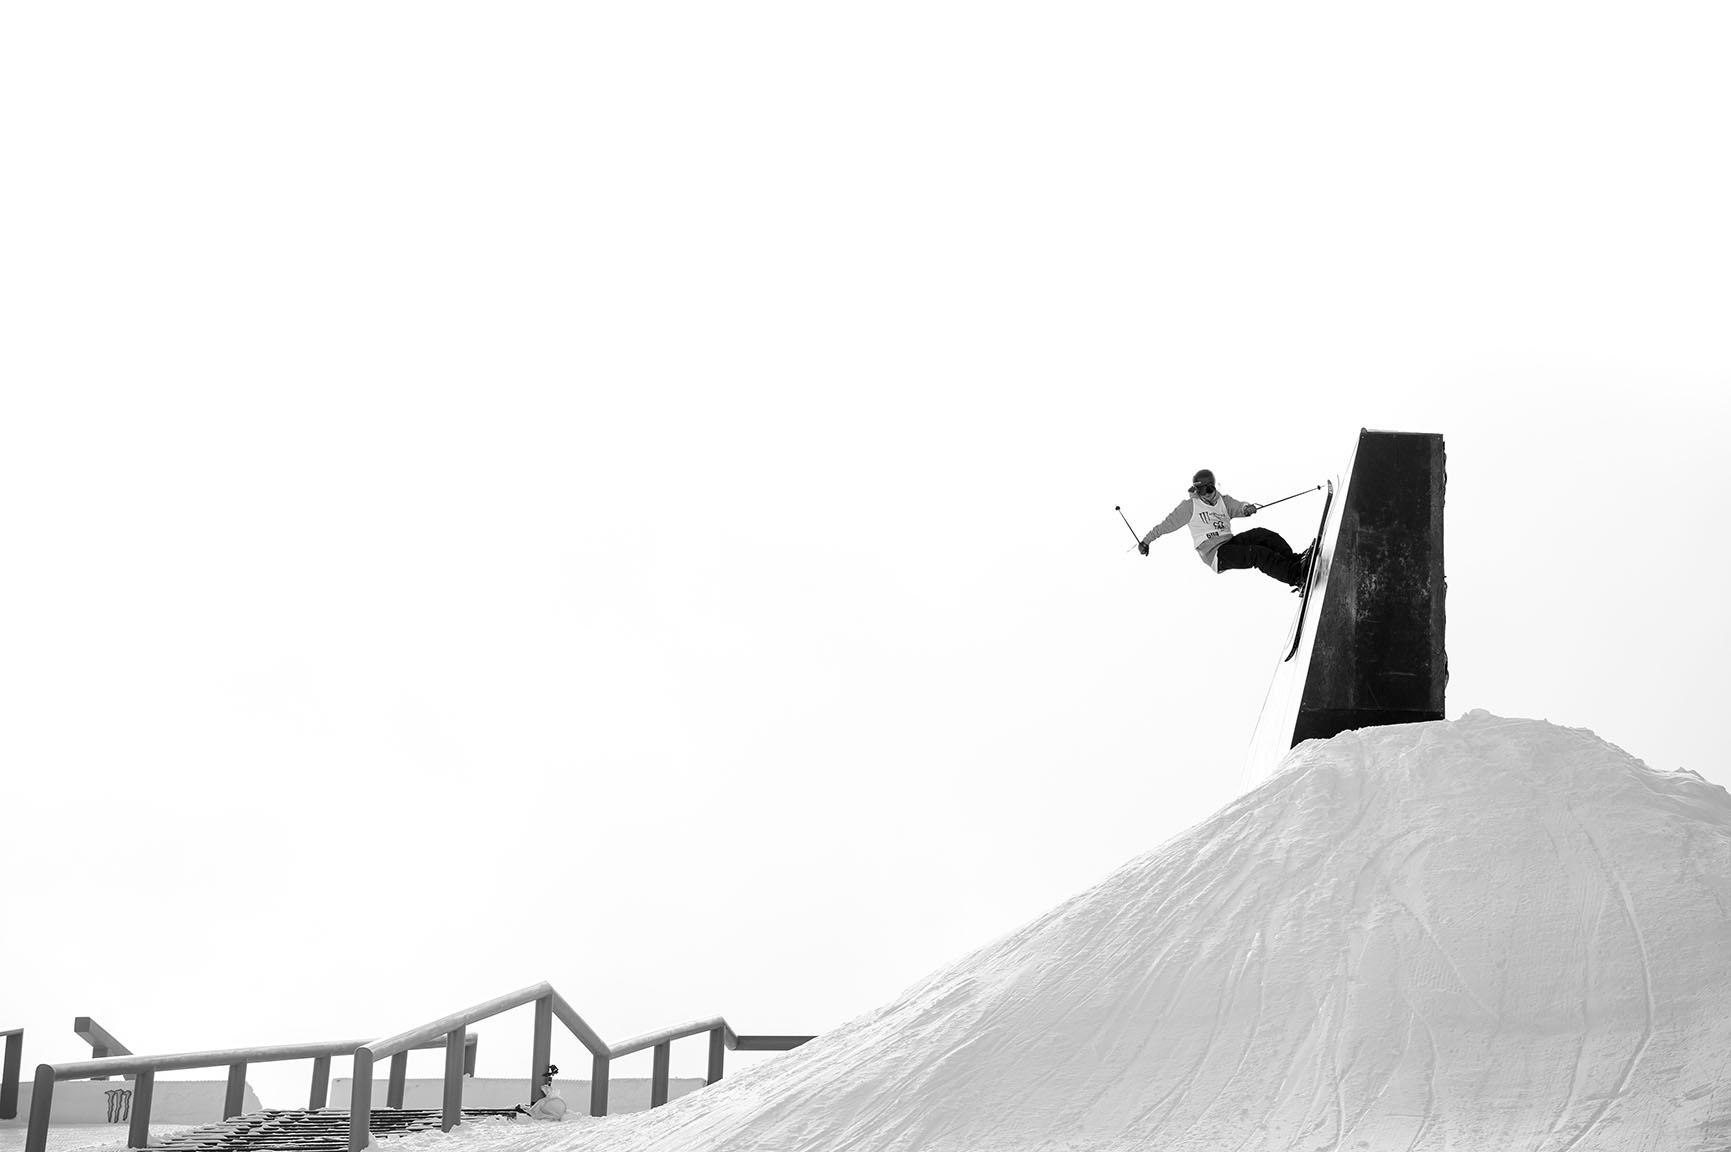 James Woods, Ski Slopestyle Qualifier